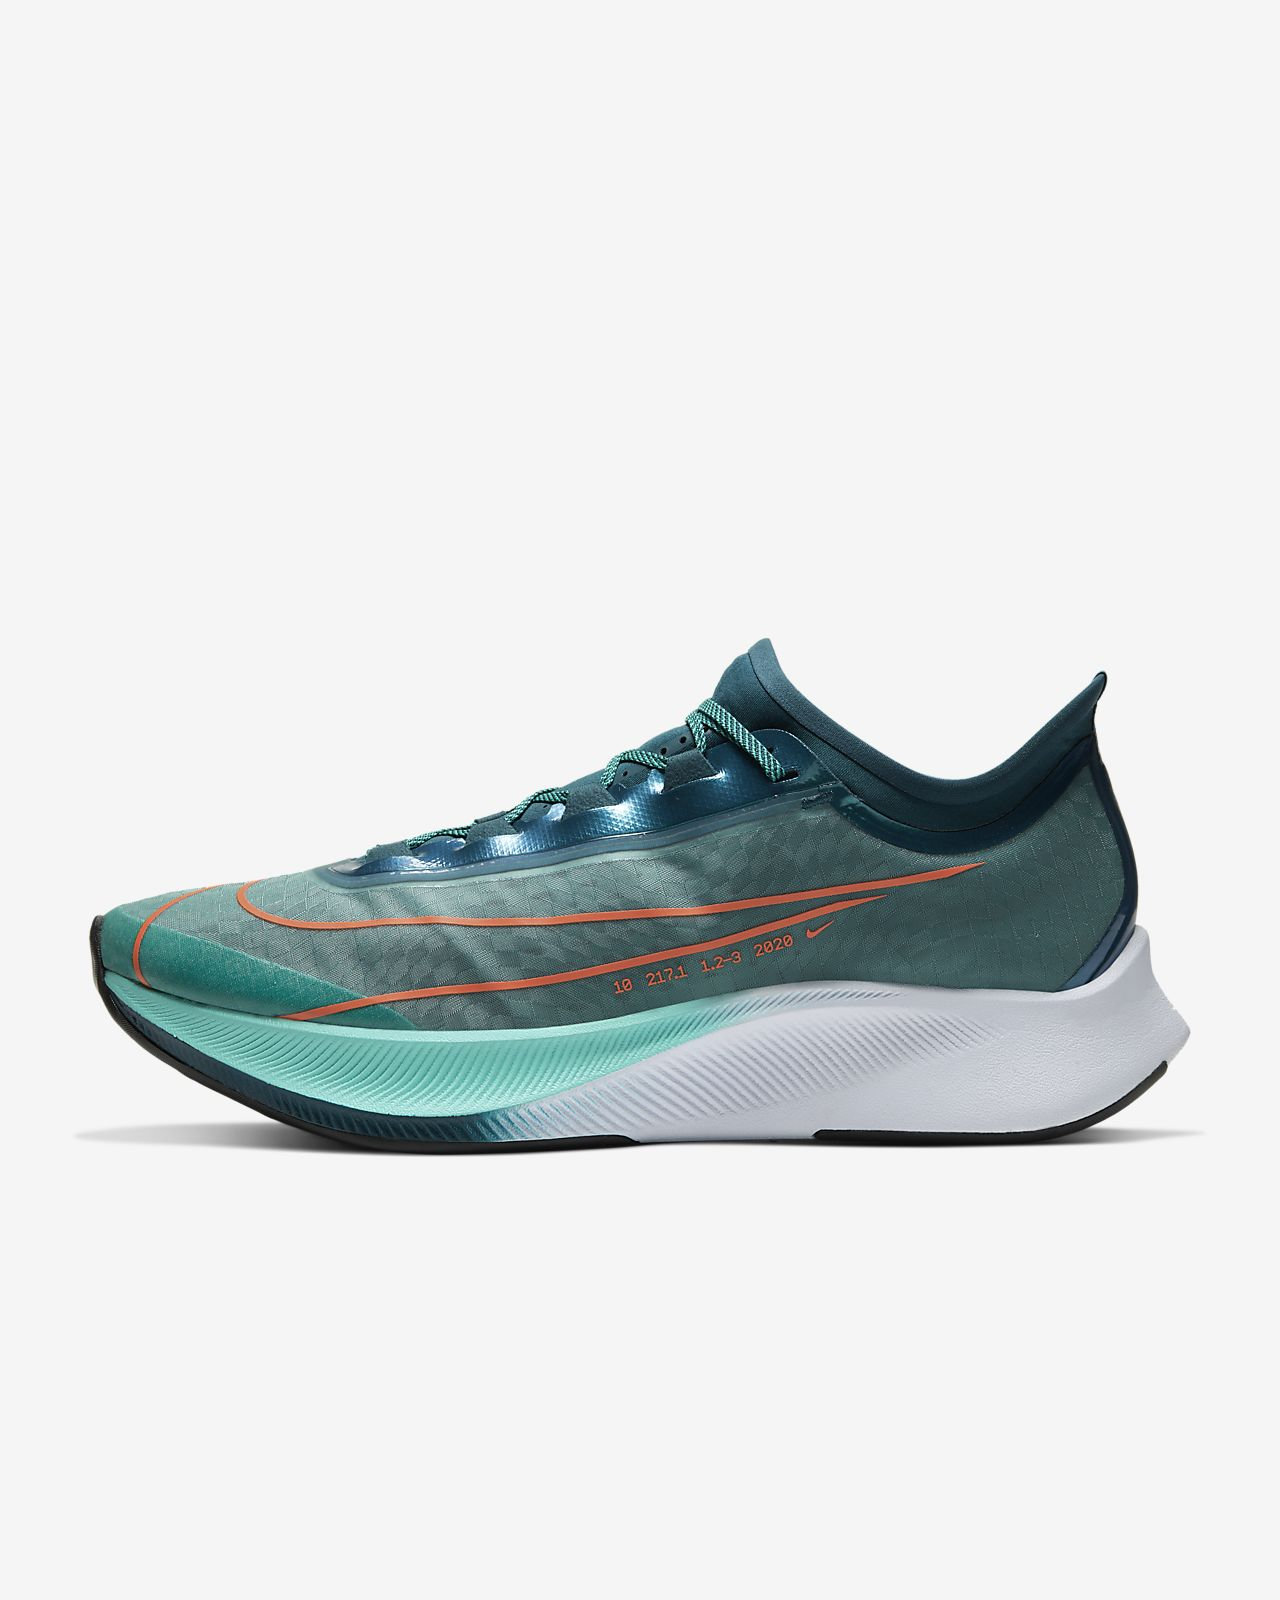 Nike Zoom Fly 3 Premium Herren-Laufschuh